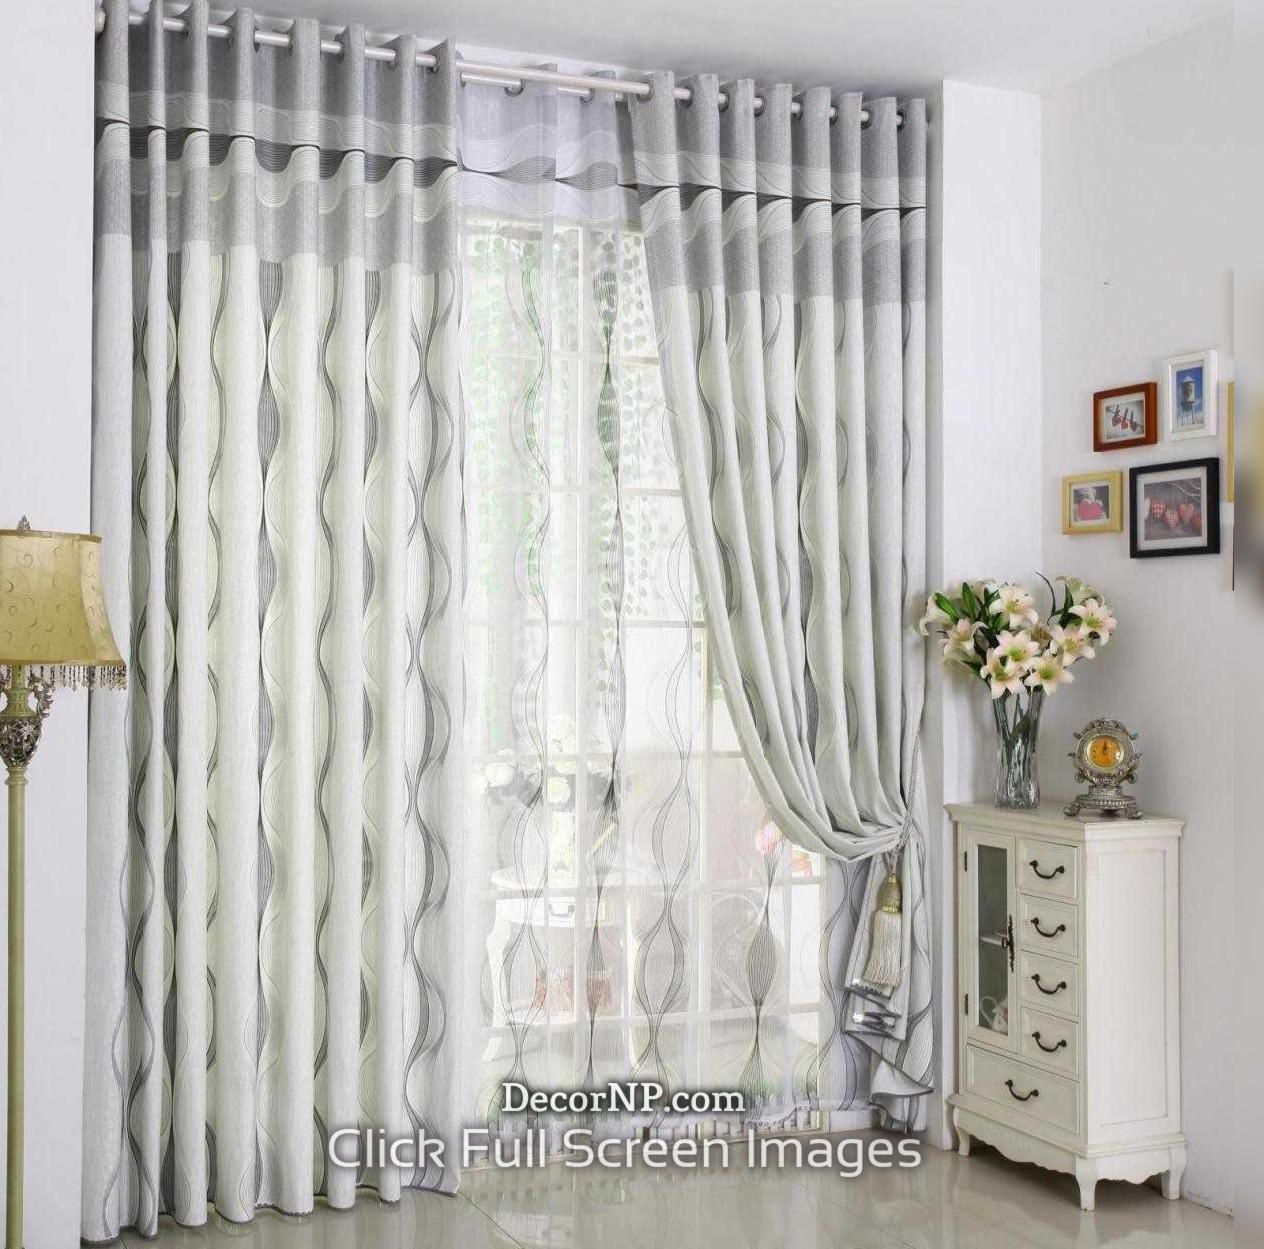 White Curtain Design 2019 Best White Curtain Models In 2020